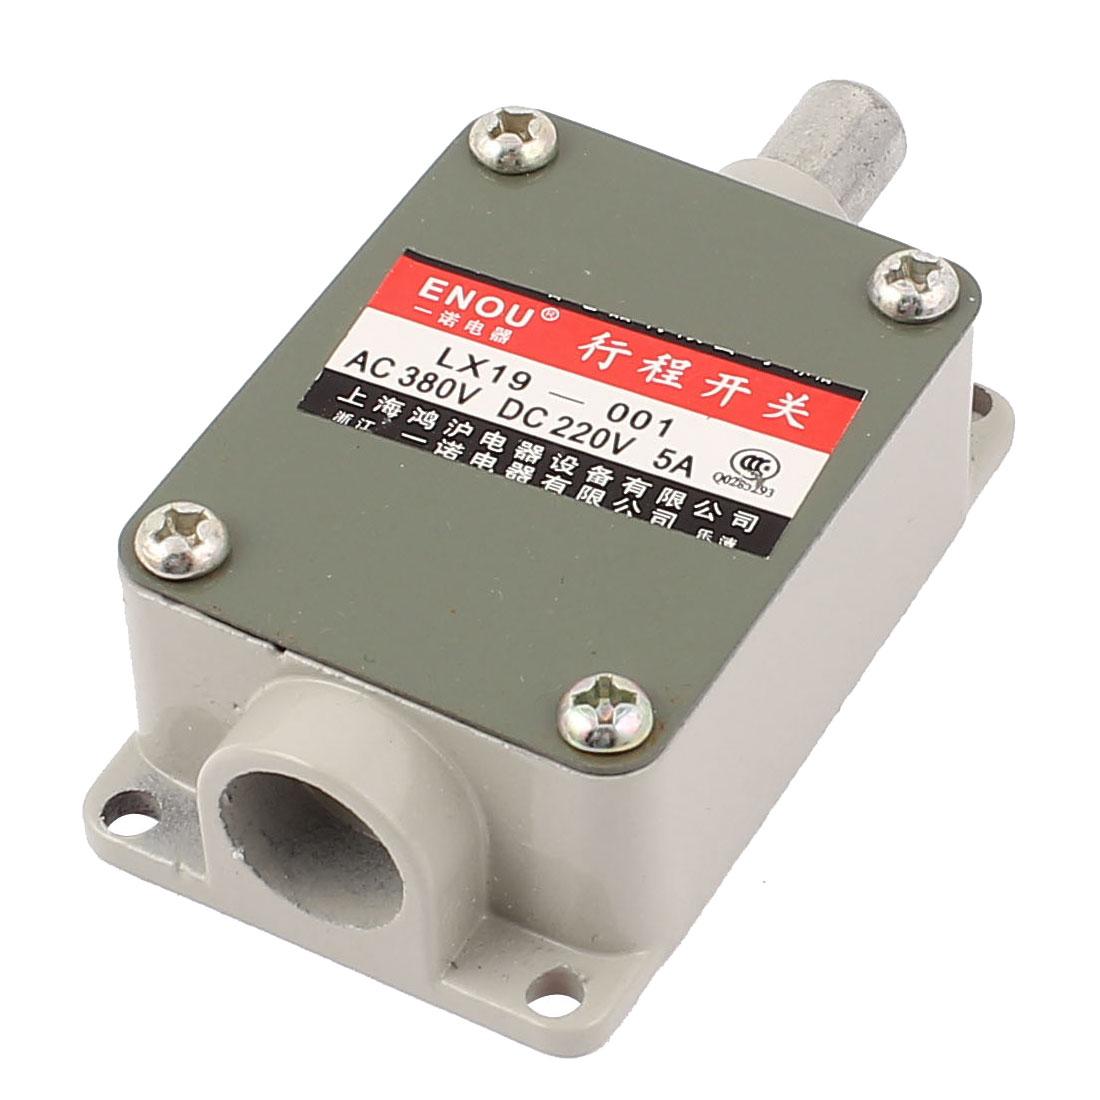 LX19-001 AC 380V DC220V 1NO 1NC SPDT Momentary Push Plunger Limit Switch